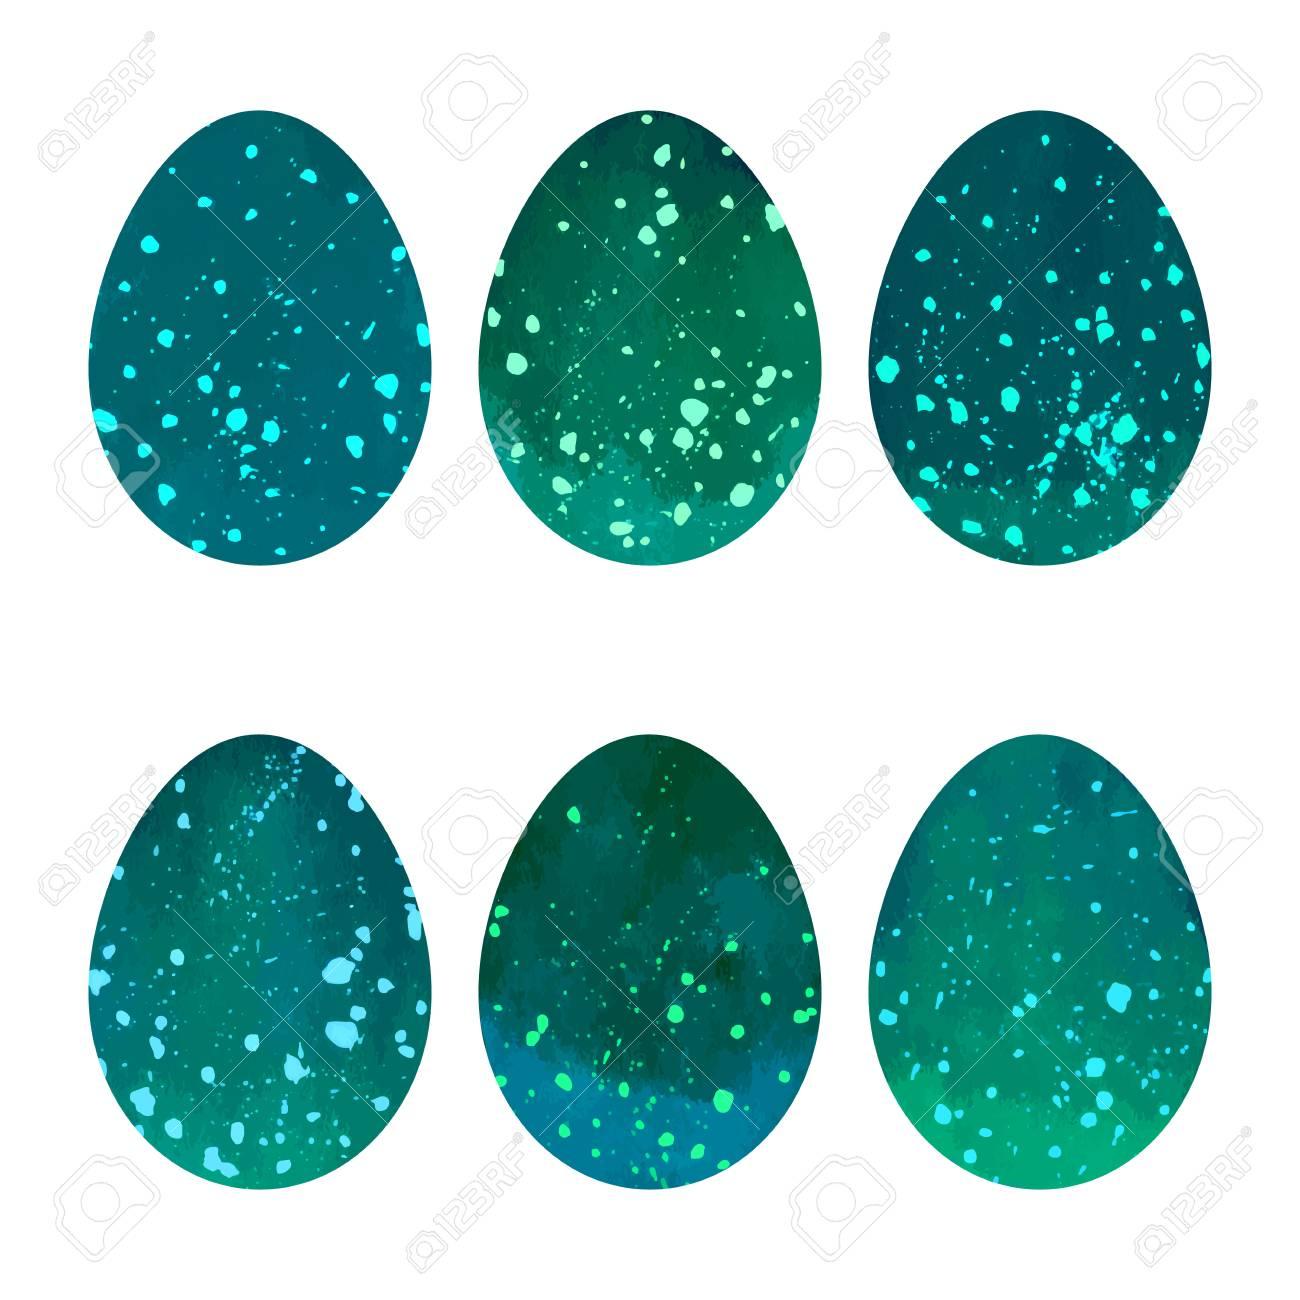 Watercolor Easter eggs set. Vector design elements. - 69126957